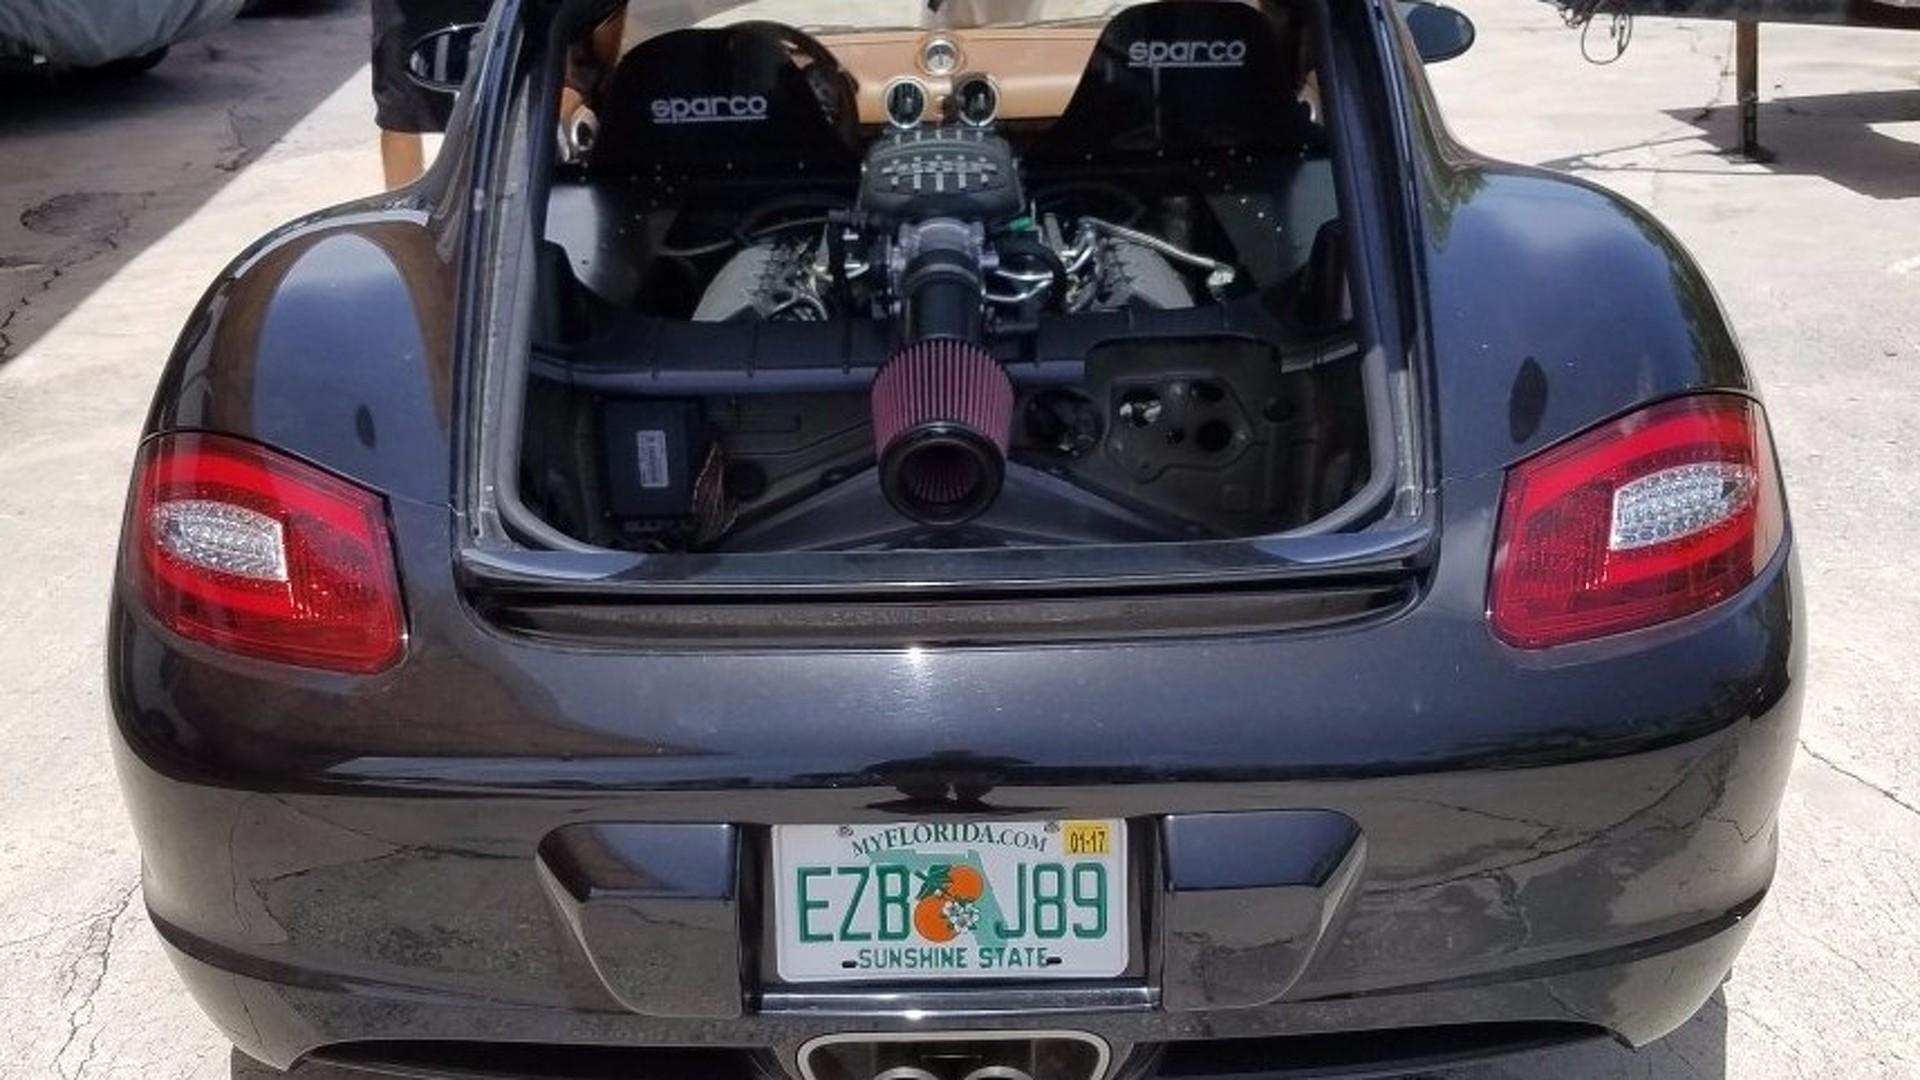 Porsche Cayman receives Ford 5 0L V8 conversion